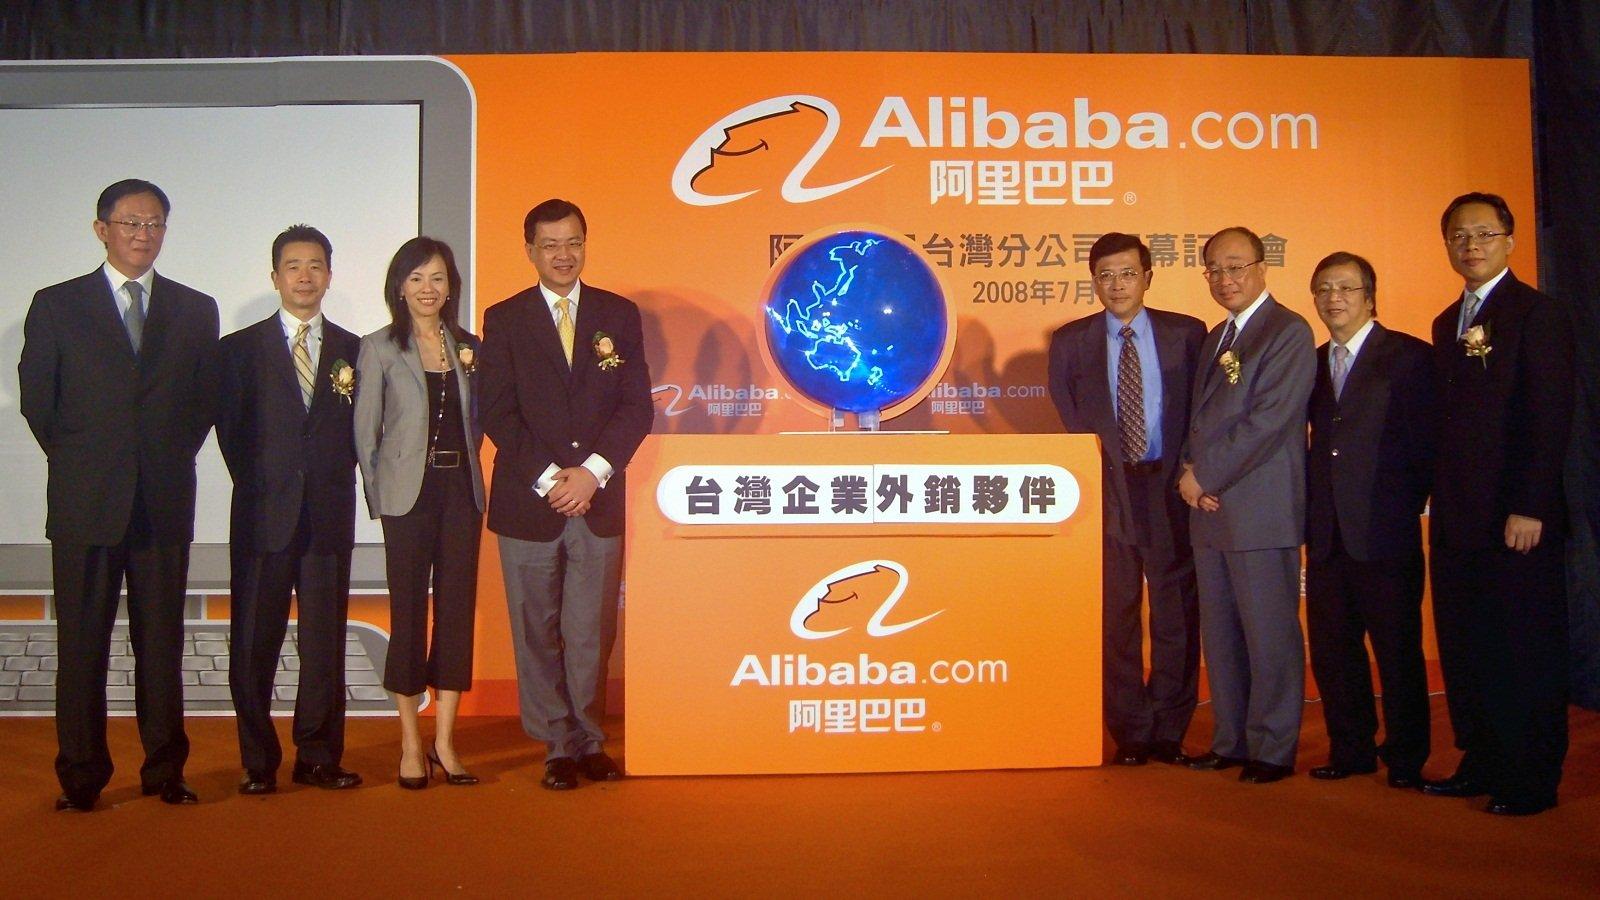 Alibaba выкупит китайский сервис доставки еды Ele.me за $10 млрд